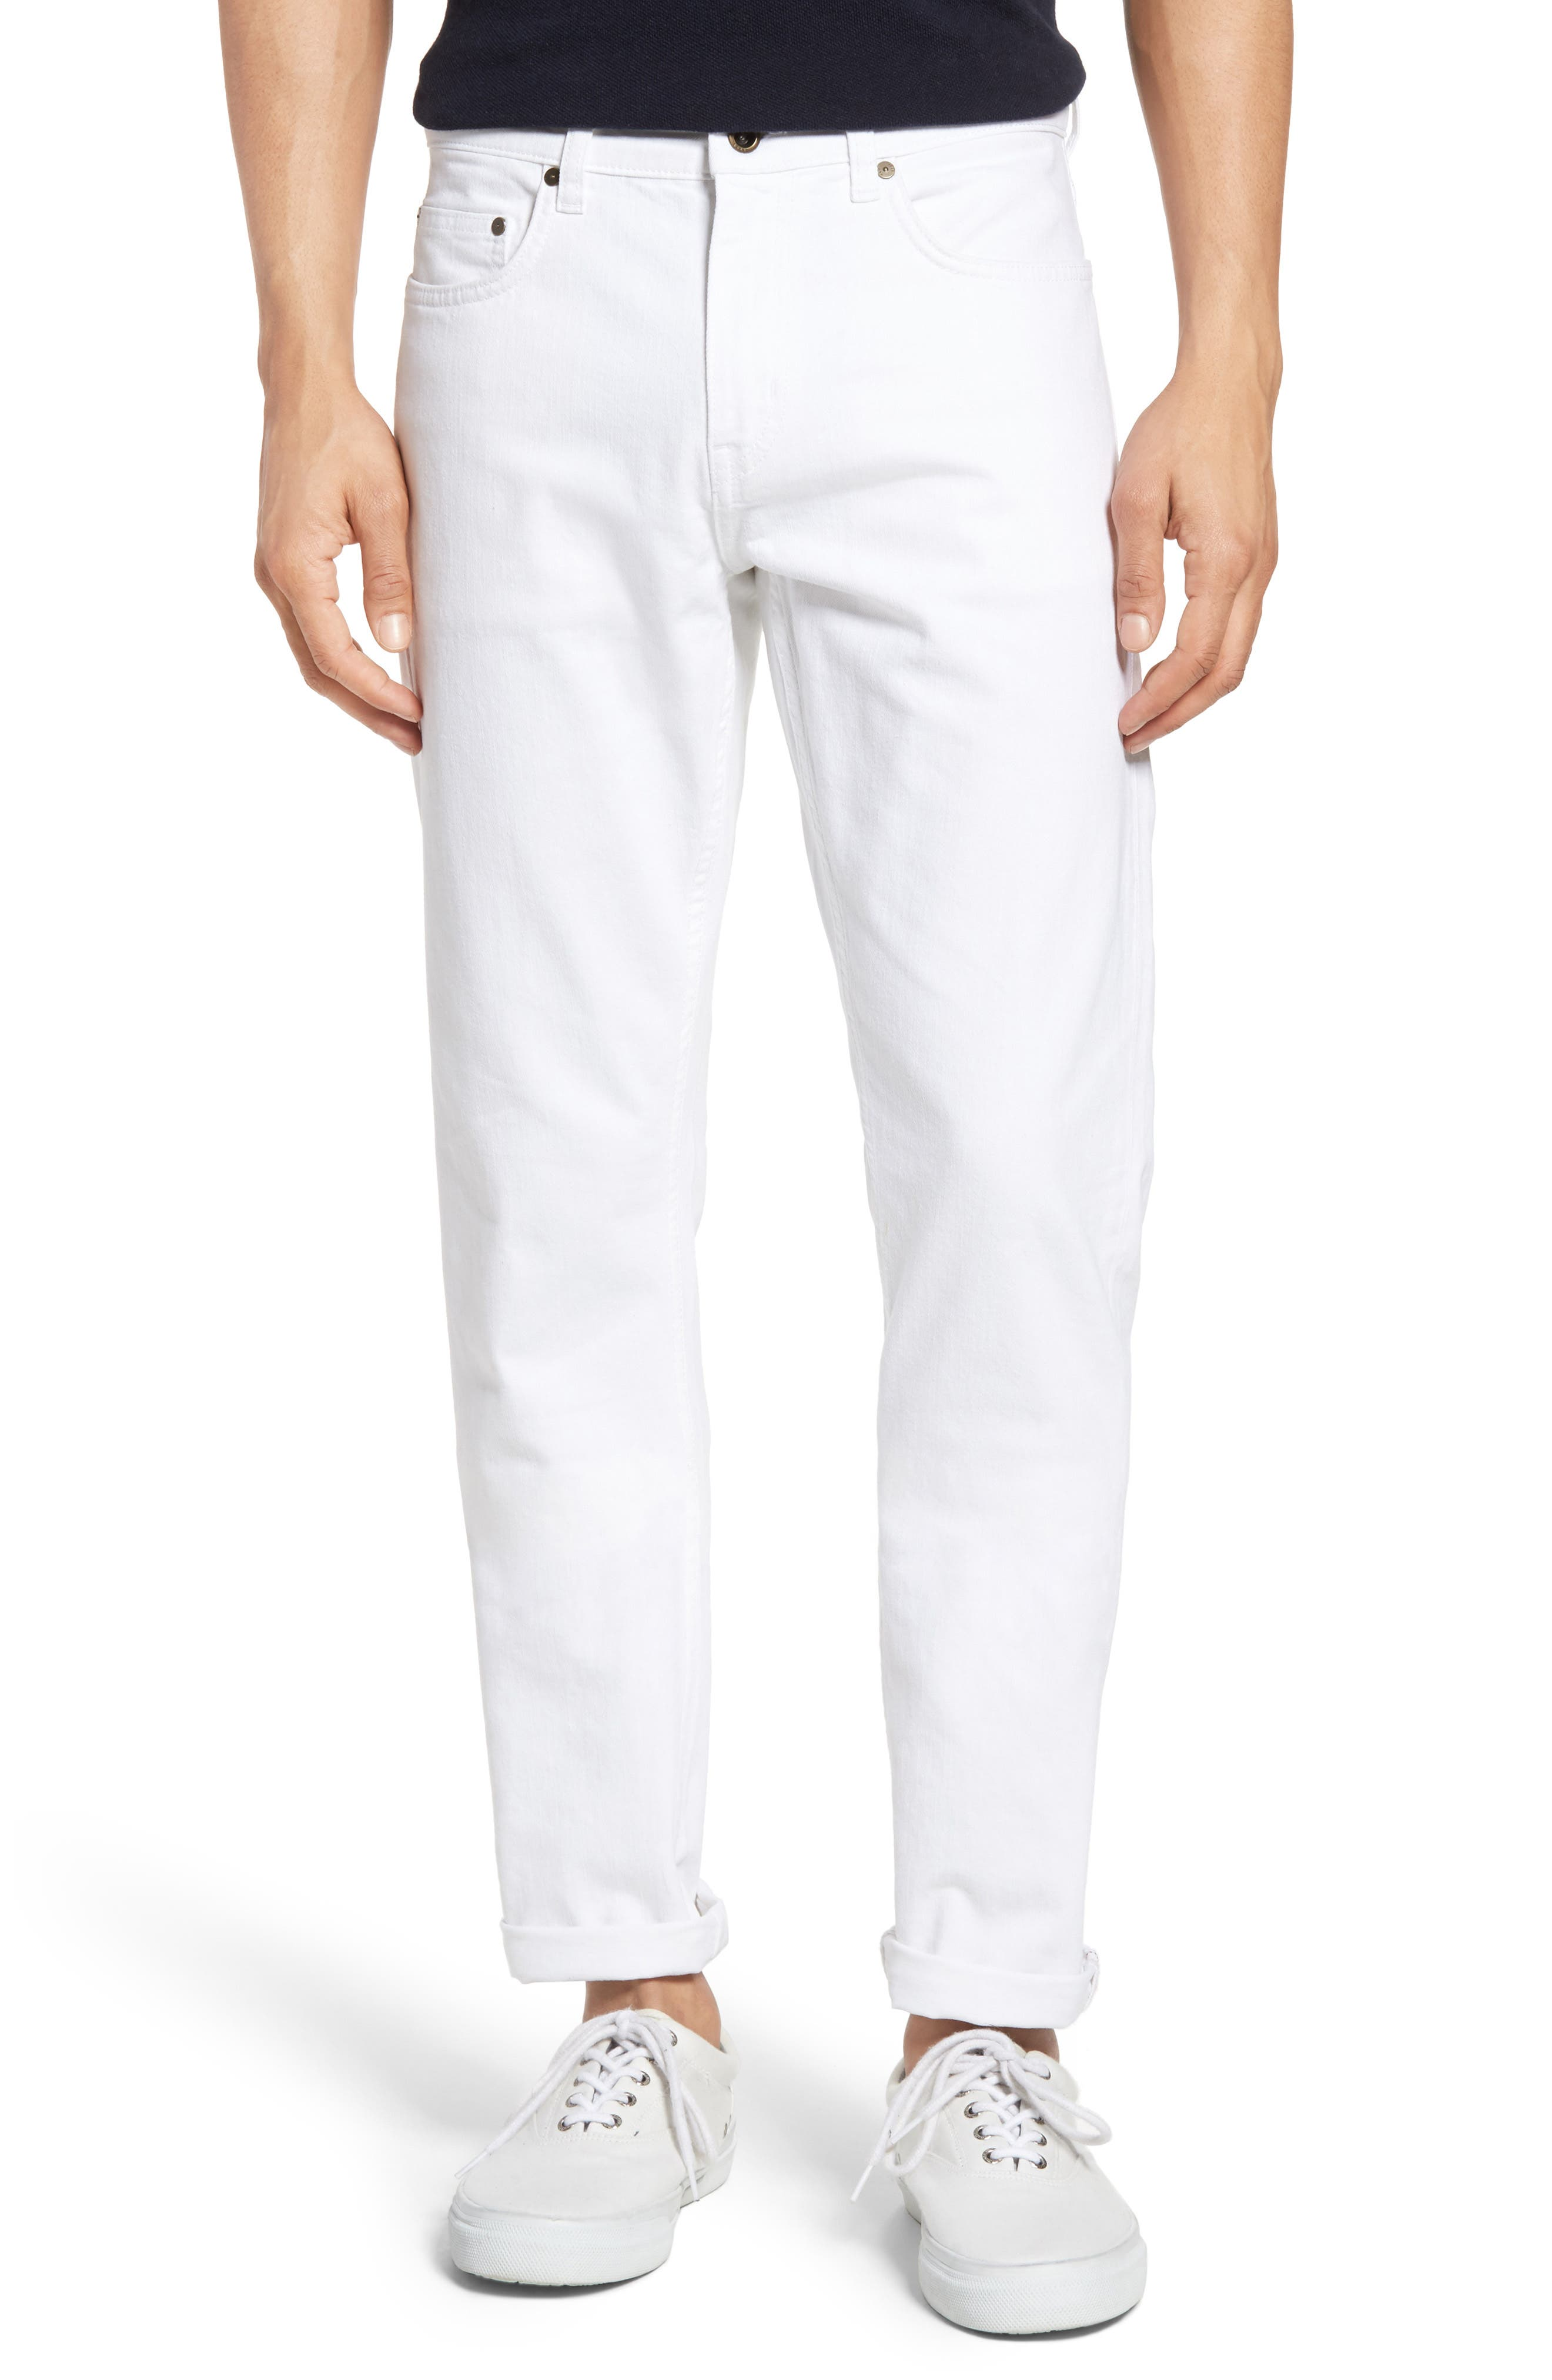 Allemand Straight Leg Jeans,                             Main thumbnail 1, color,                             111